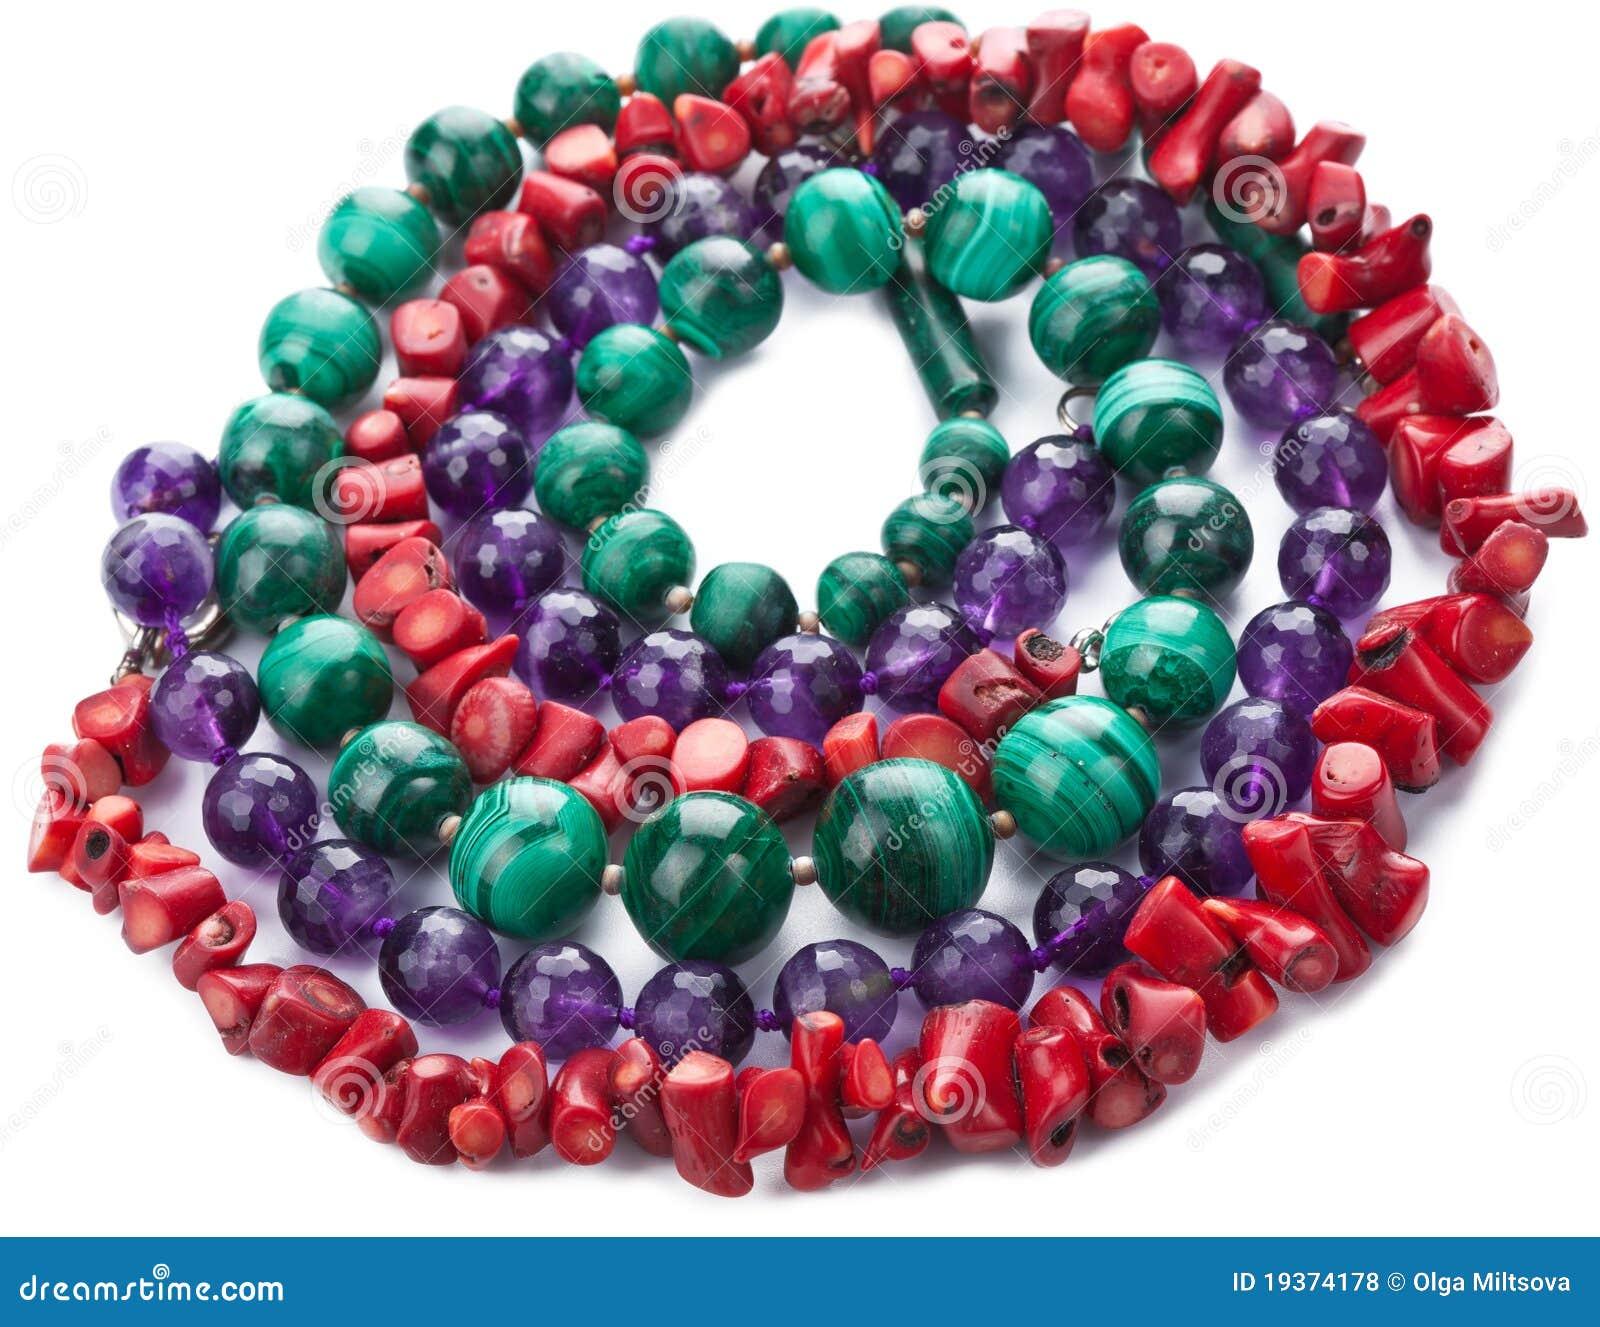 Colares naturais coloridas isoladas